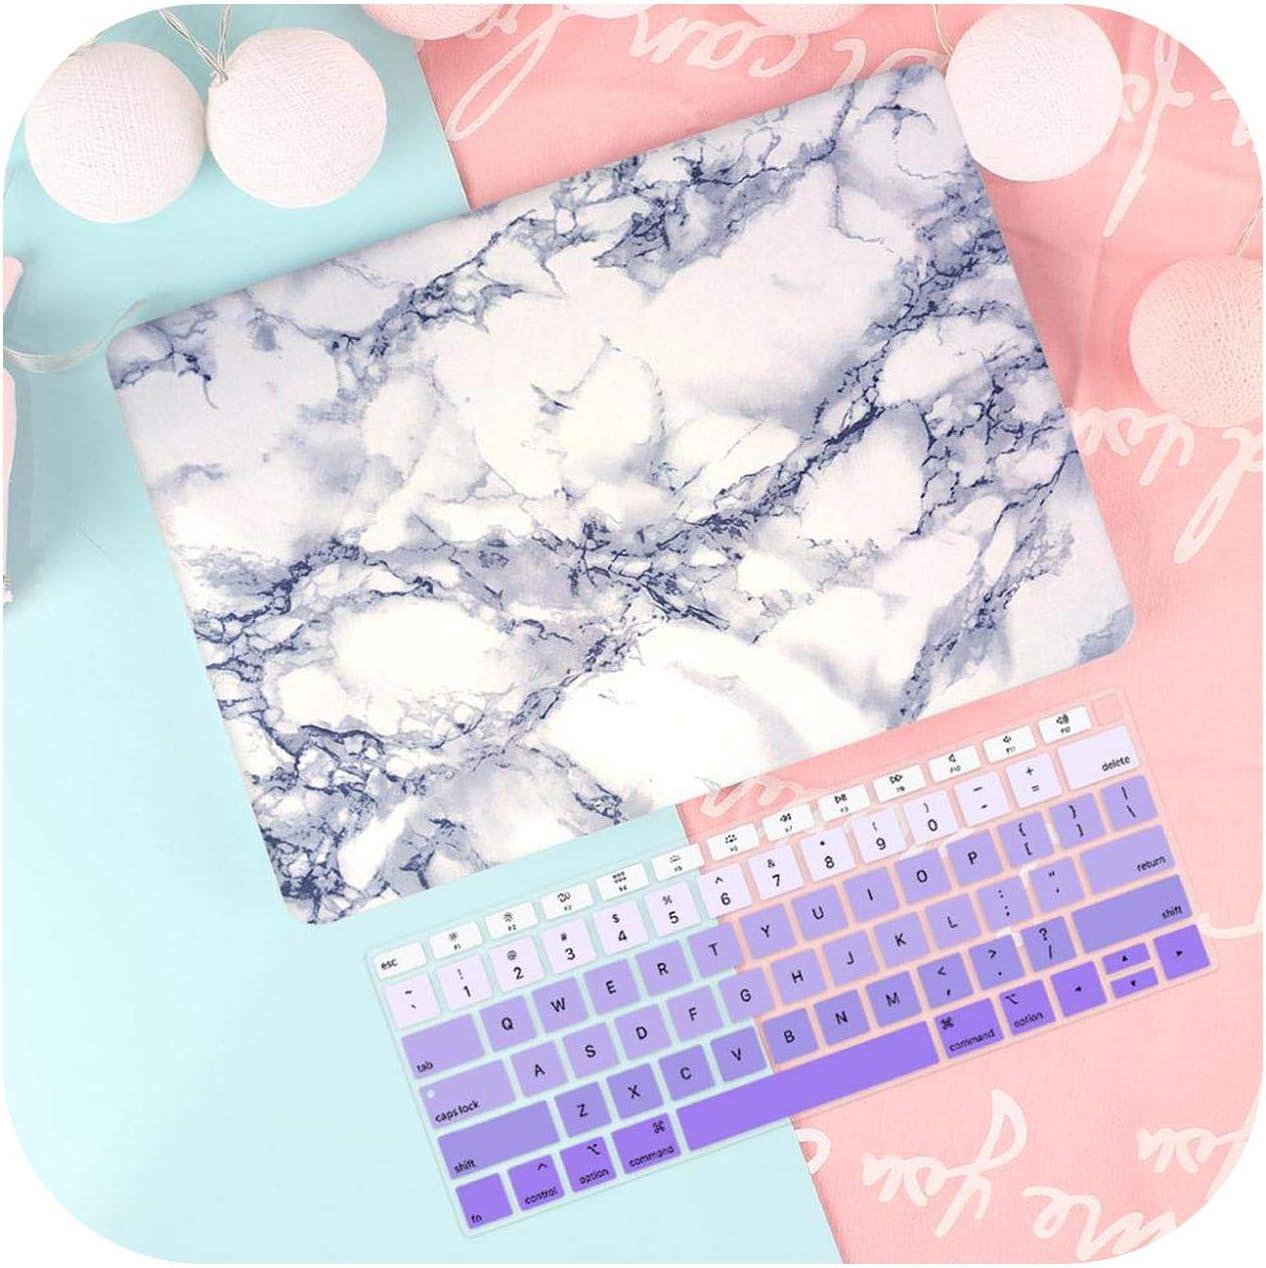 New Print Case for MacBook Air Pro Retina 11 12 13.3 New Mac Book 13 15 Touch Bar 2019 A1932 A2159 A1707 A1990 Keyboard Cover-Rs874-Air 11 Inch A1465